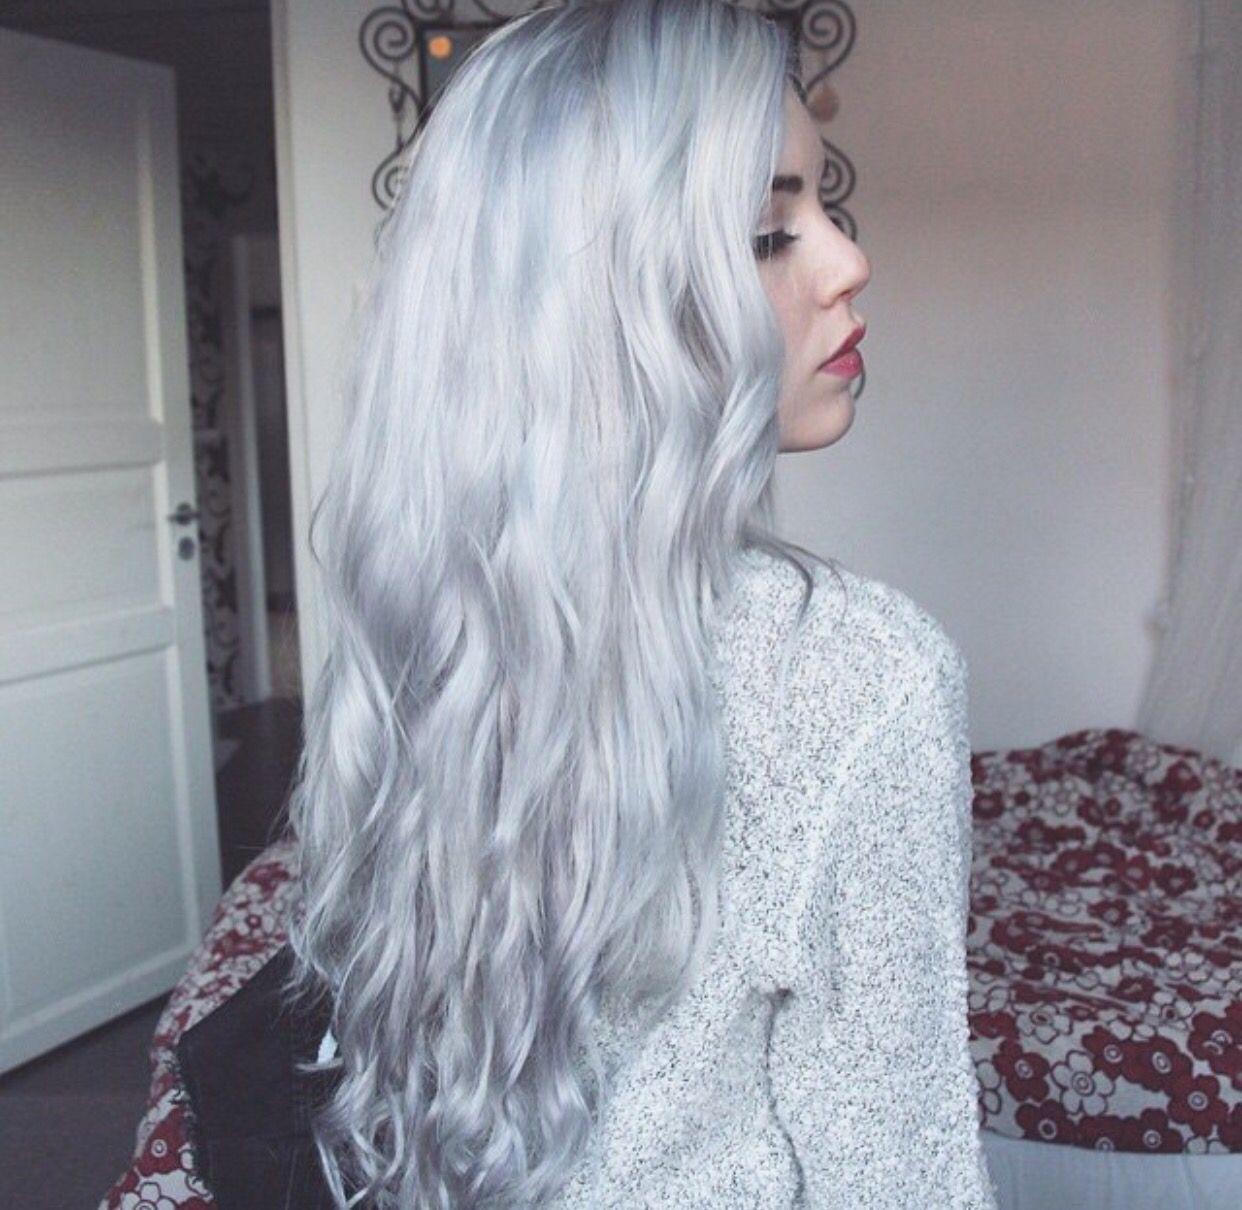 Pin by boringuser on grey white hair pinterest white hair and